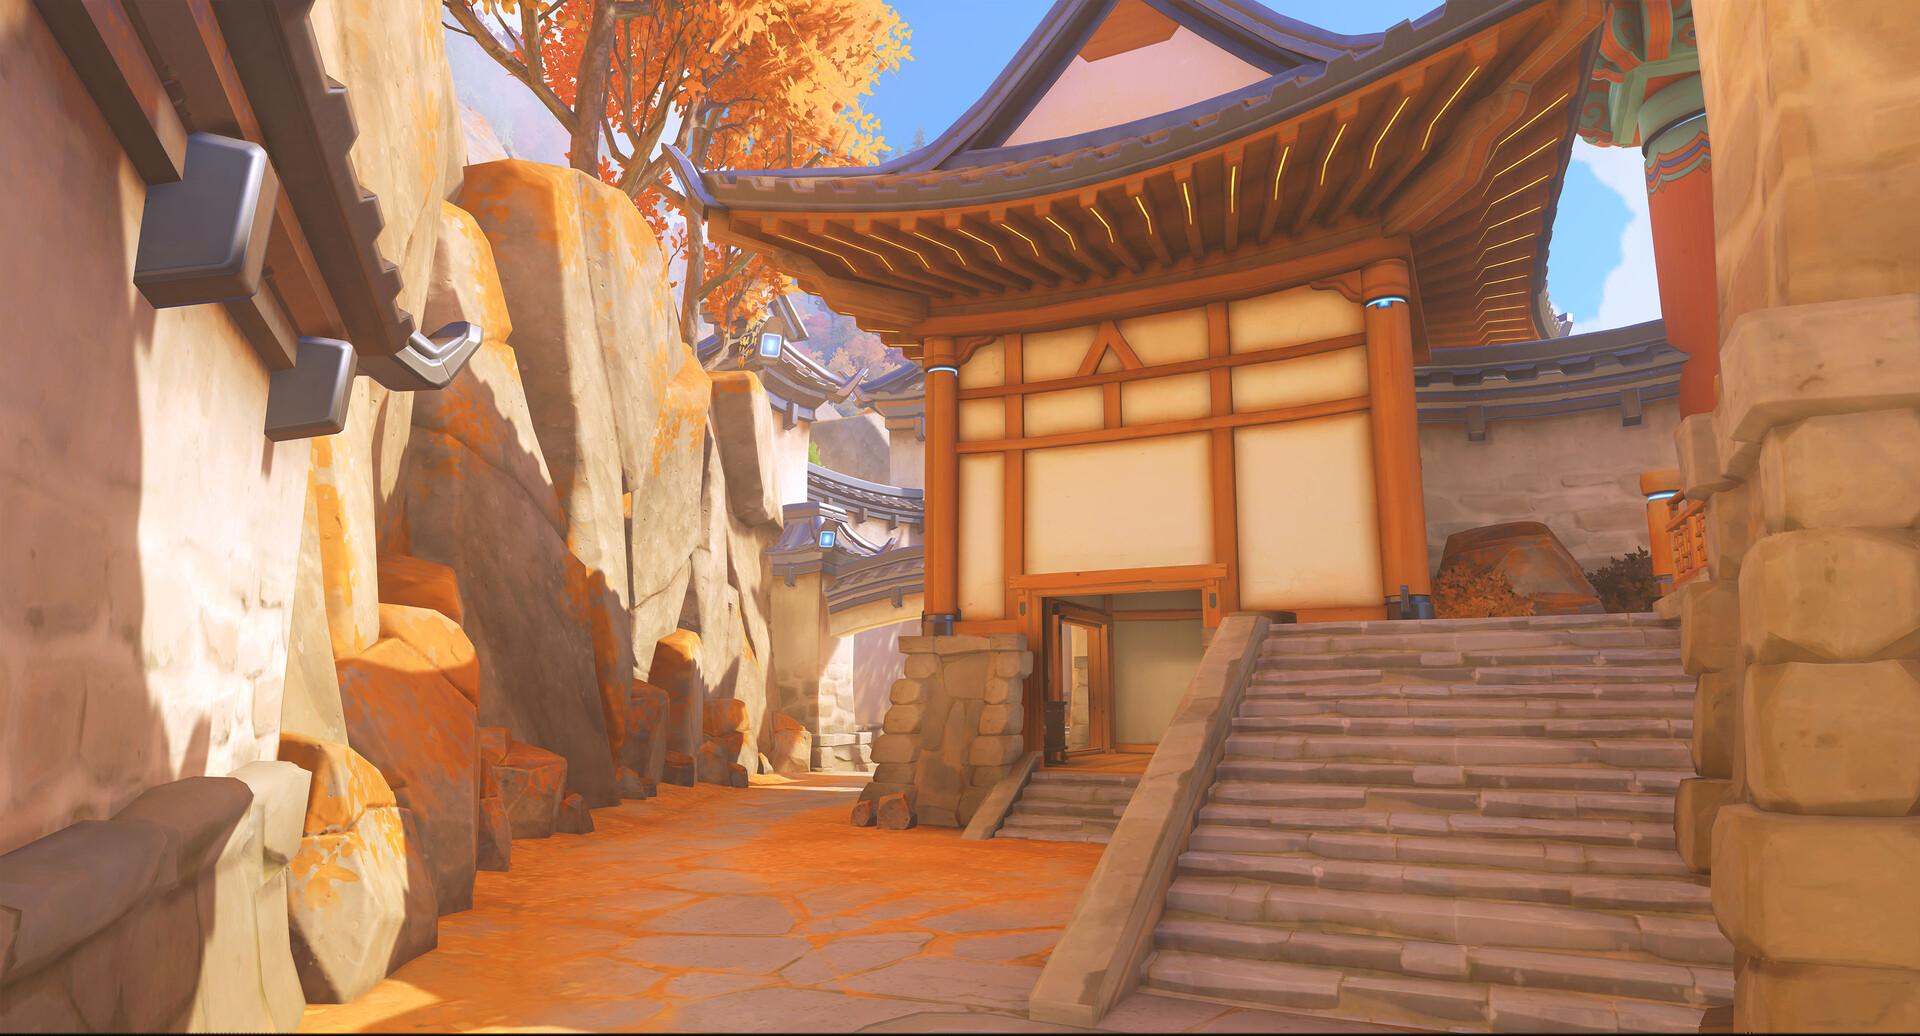 Helder pinto busan temple 09